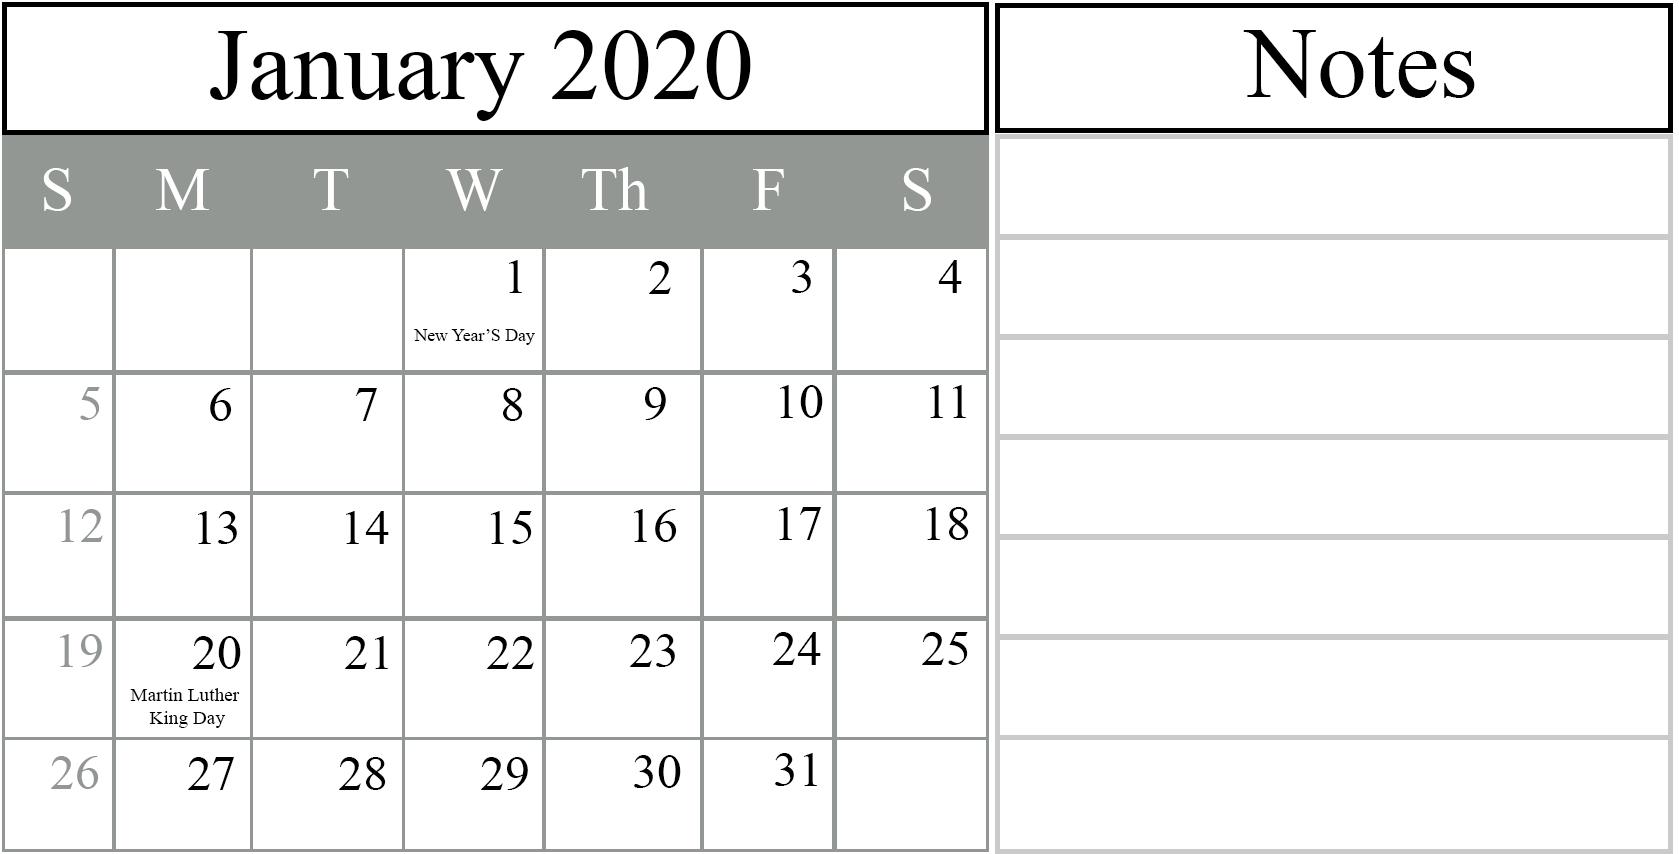 Nanakshahi Calendar 2020 January | Calendar Template Printable intended for Khalsa Heera Jantri 2020 Pdf Download